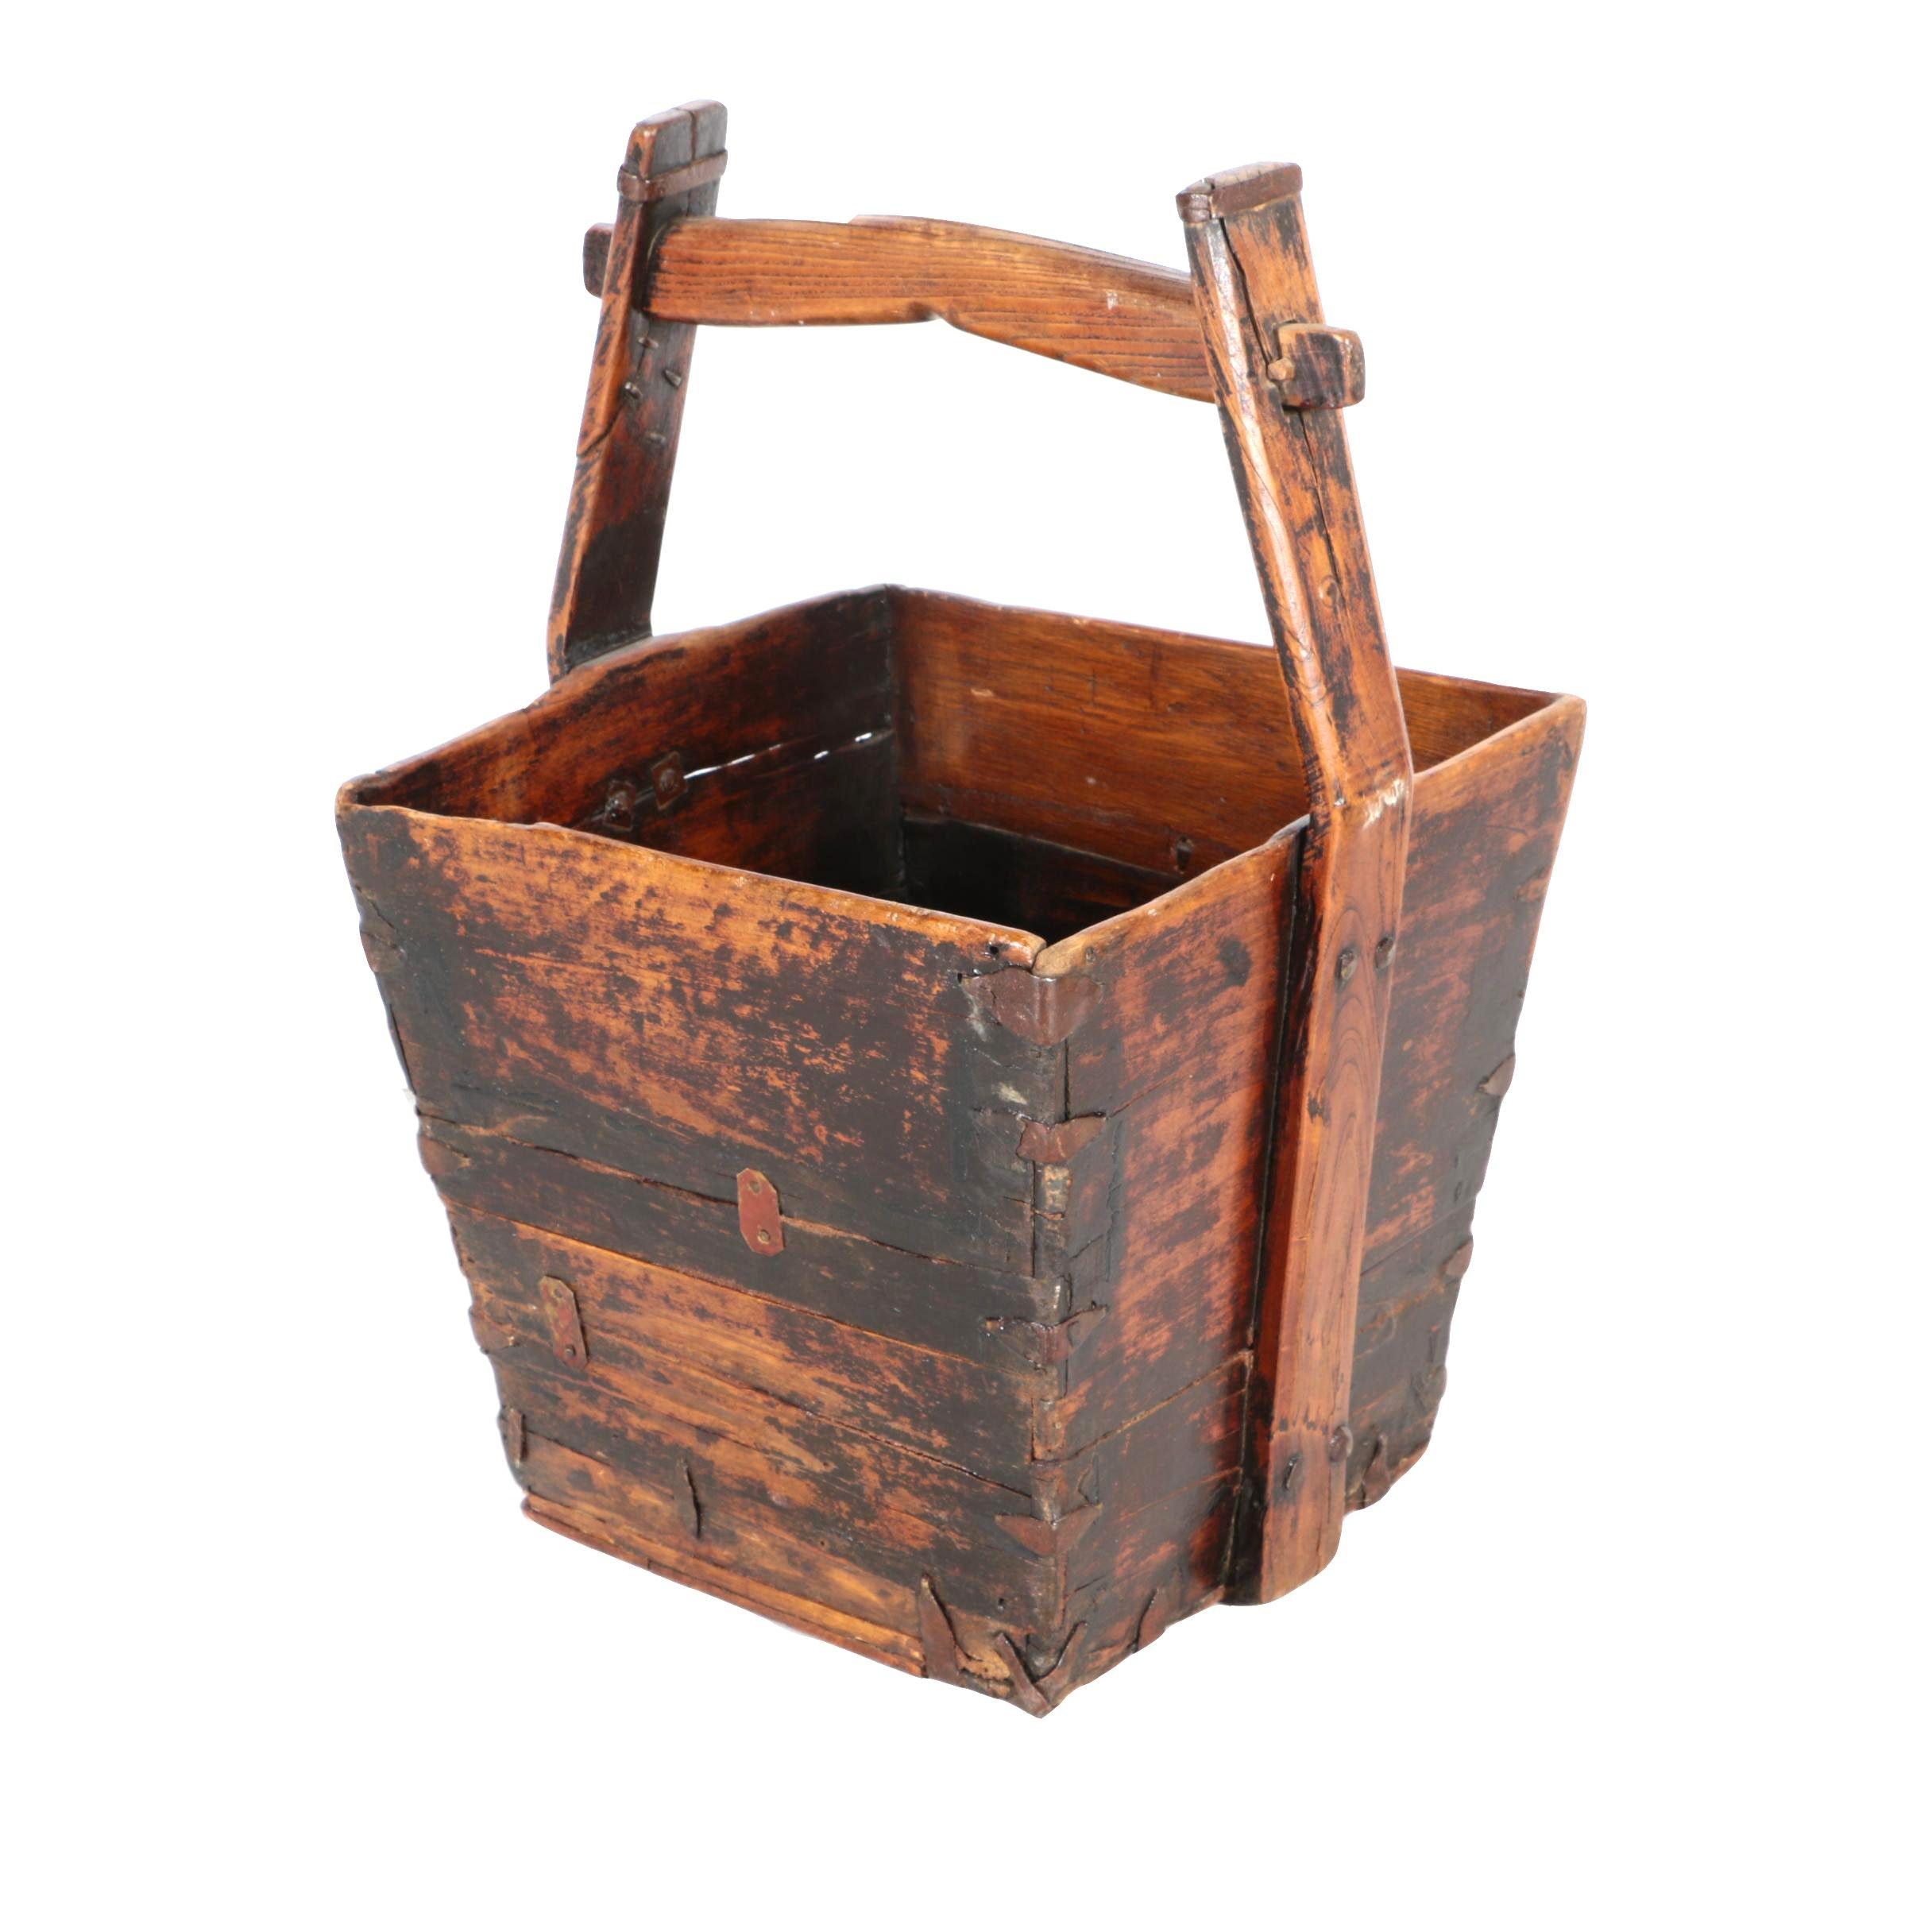 Wooden Bucket Planter